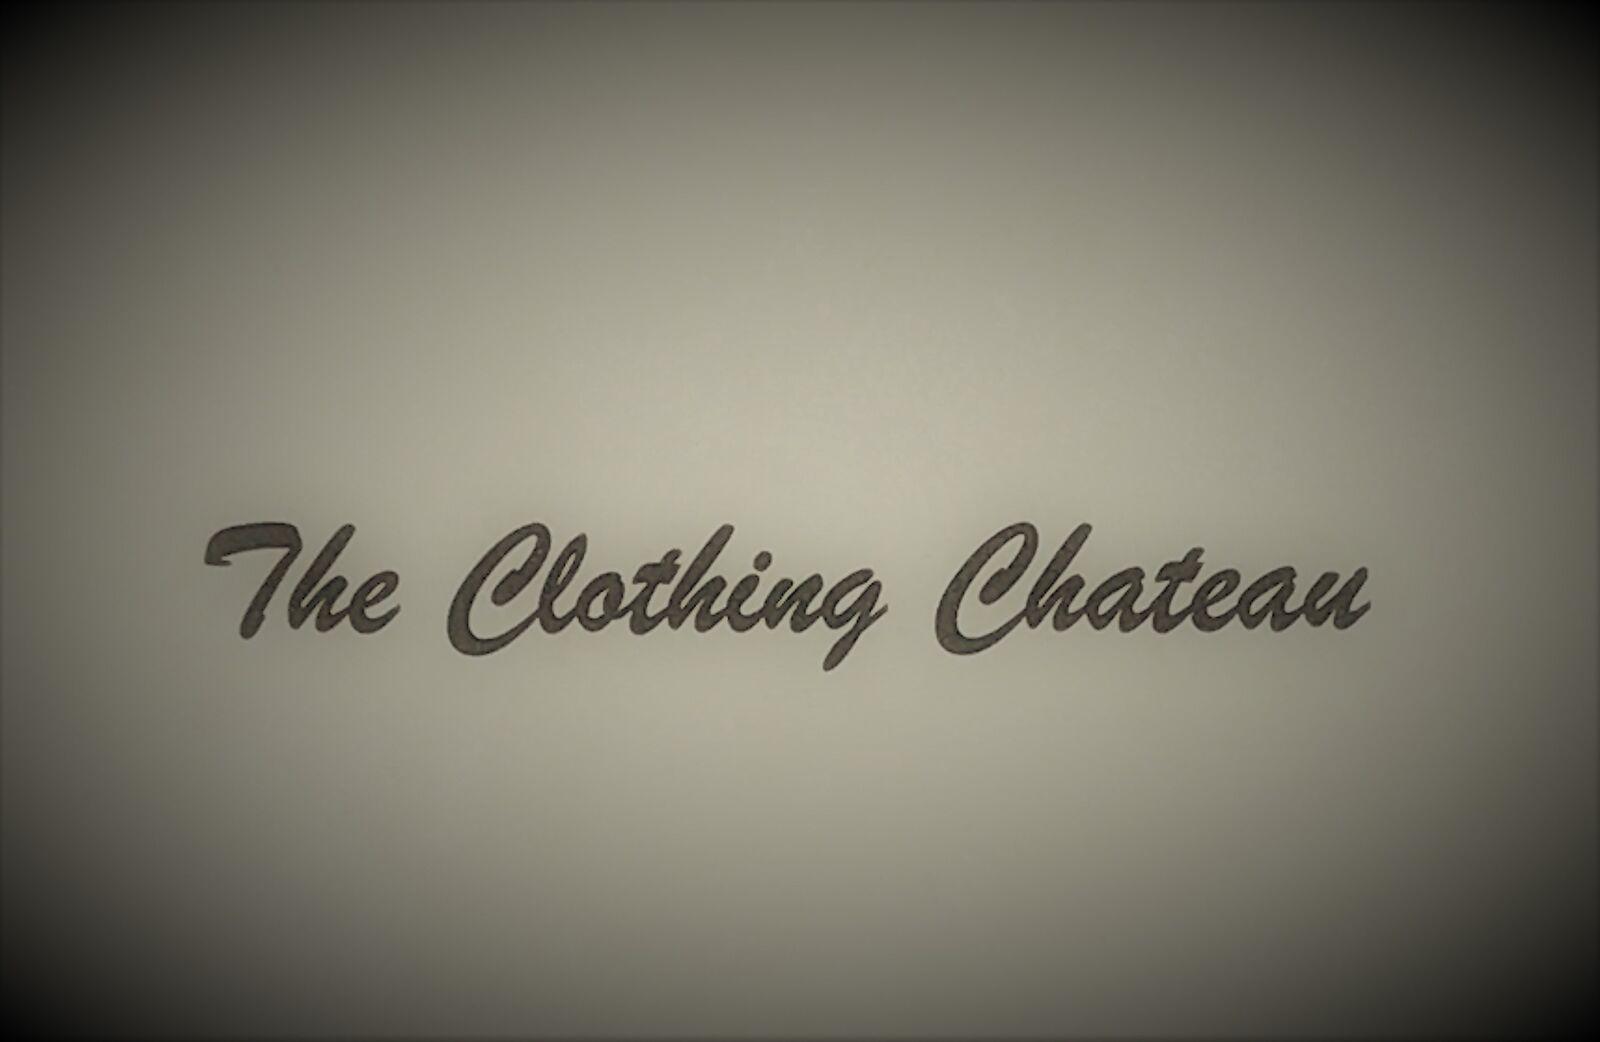 Clothing Chateau